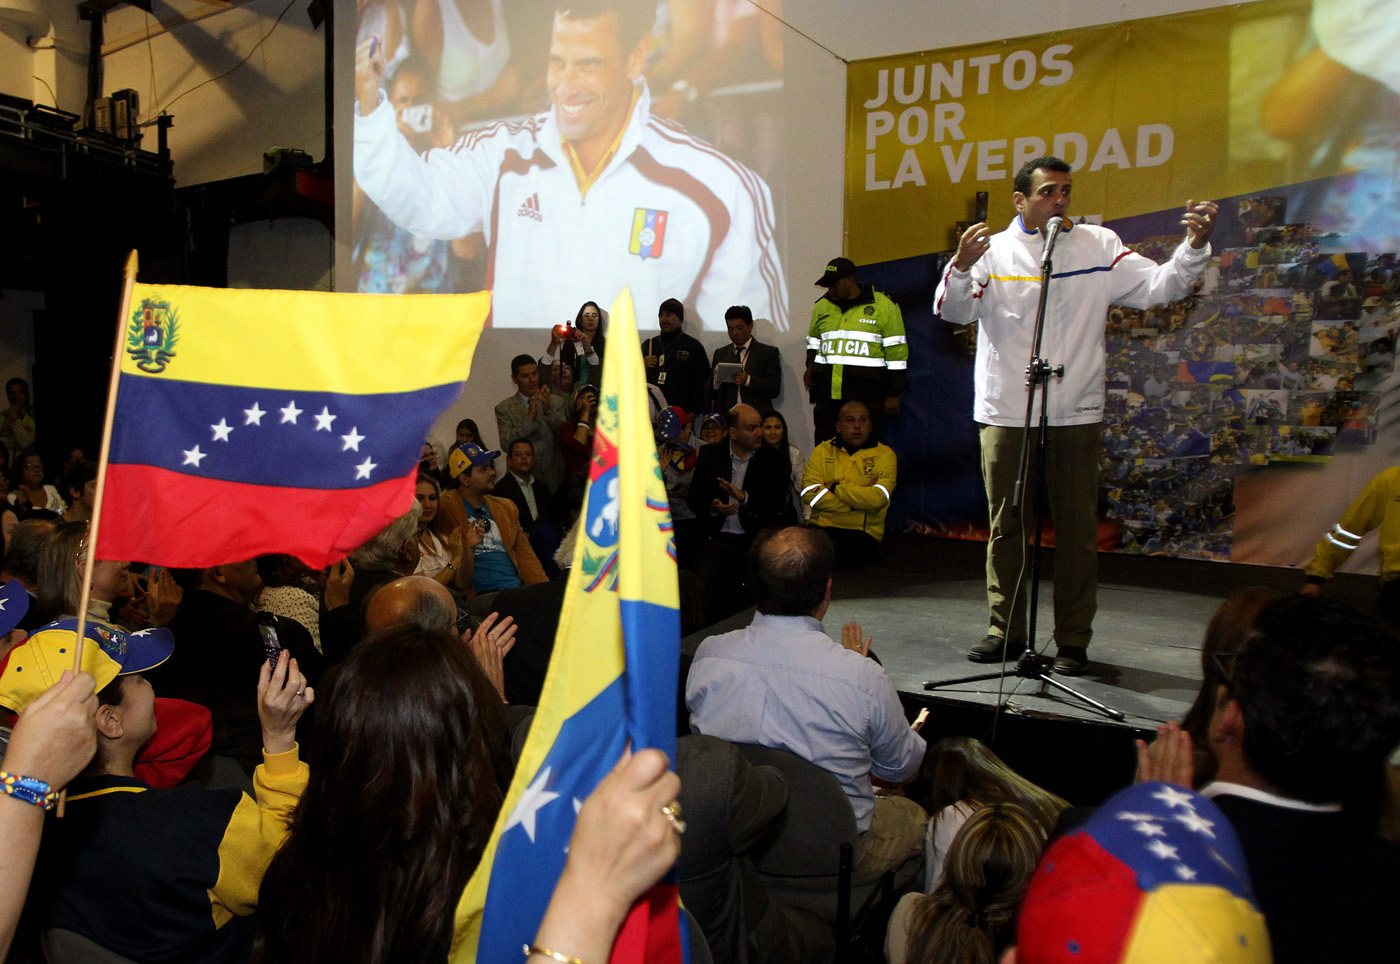 LÍDER OPOSITOR VENEZOLANO CAPRILES SE RE�NE CON SEGUIDORES EN BOGOTÁ